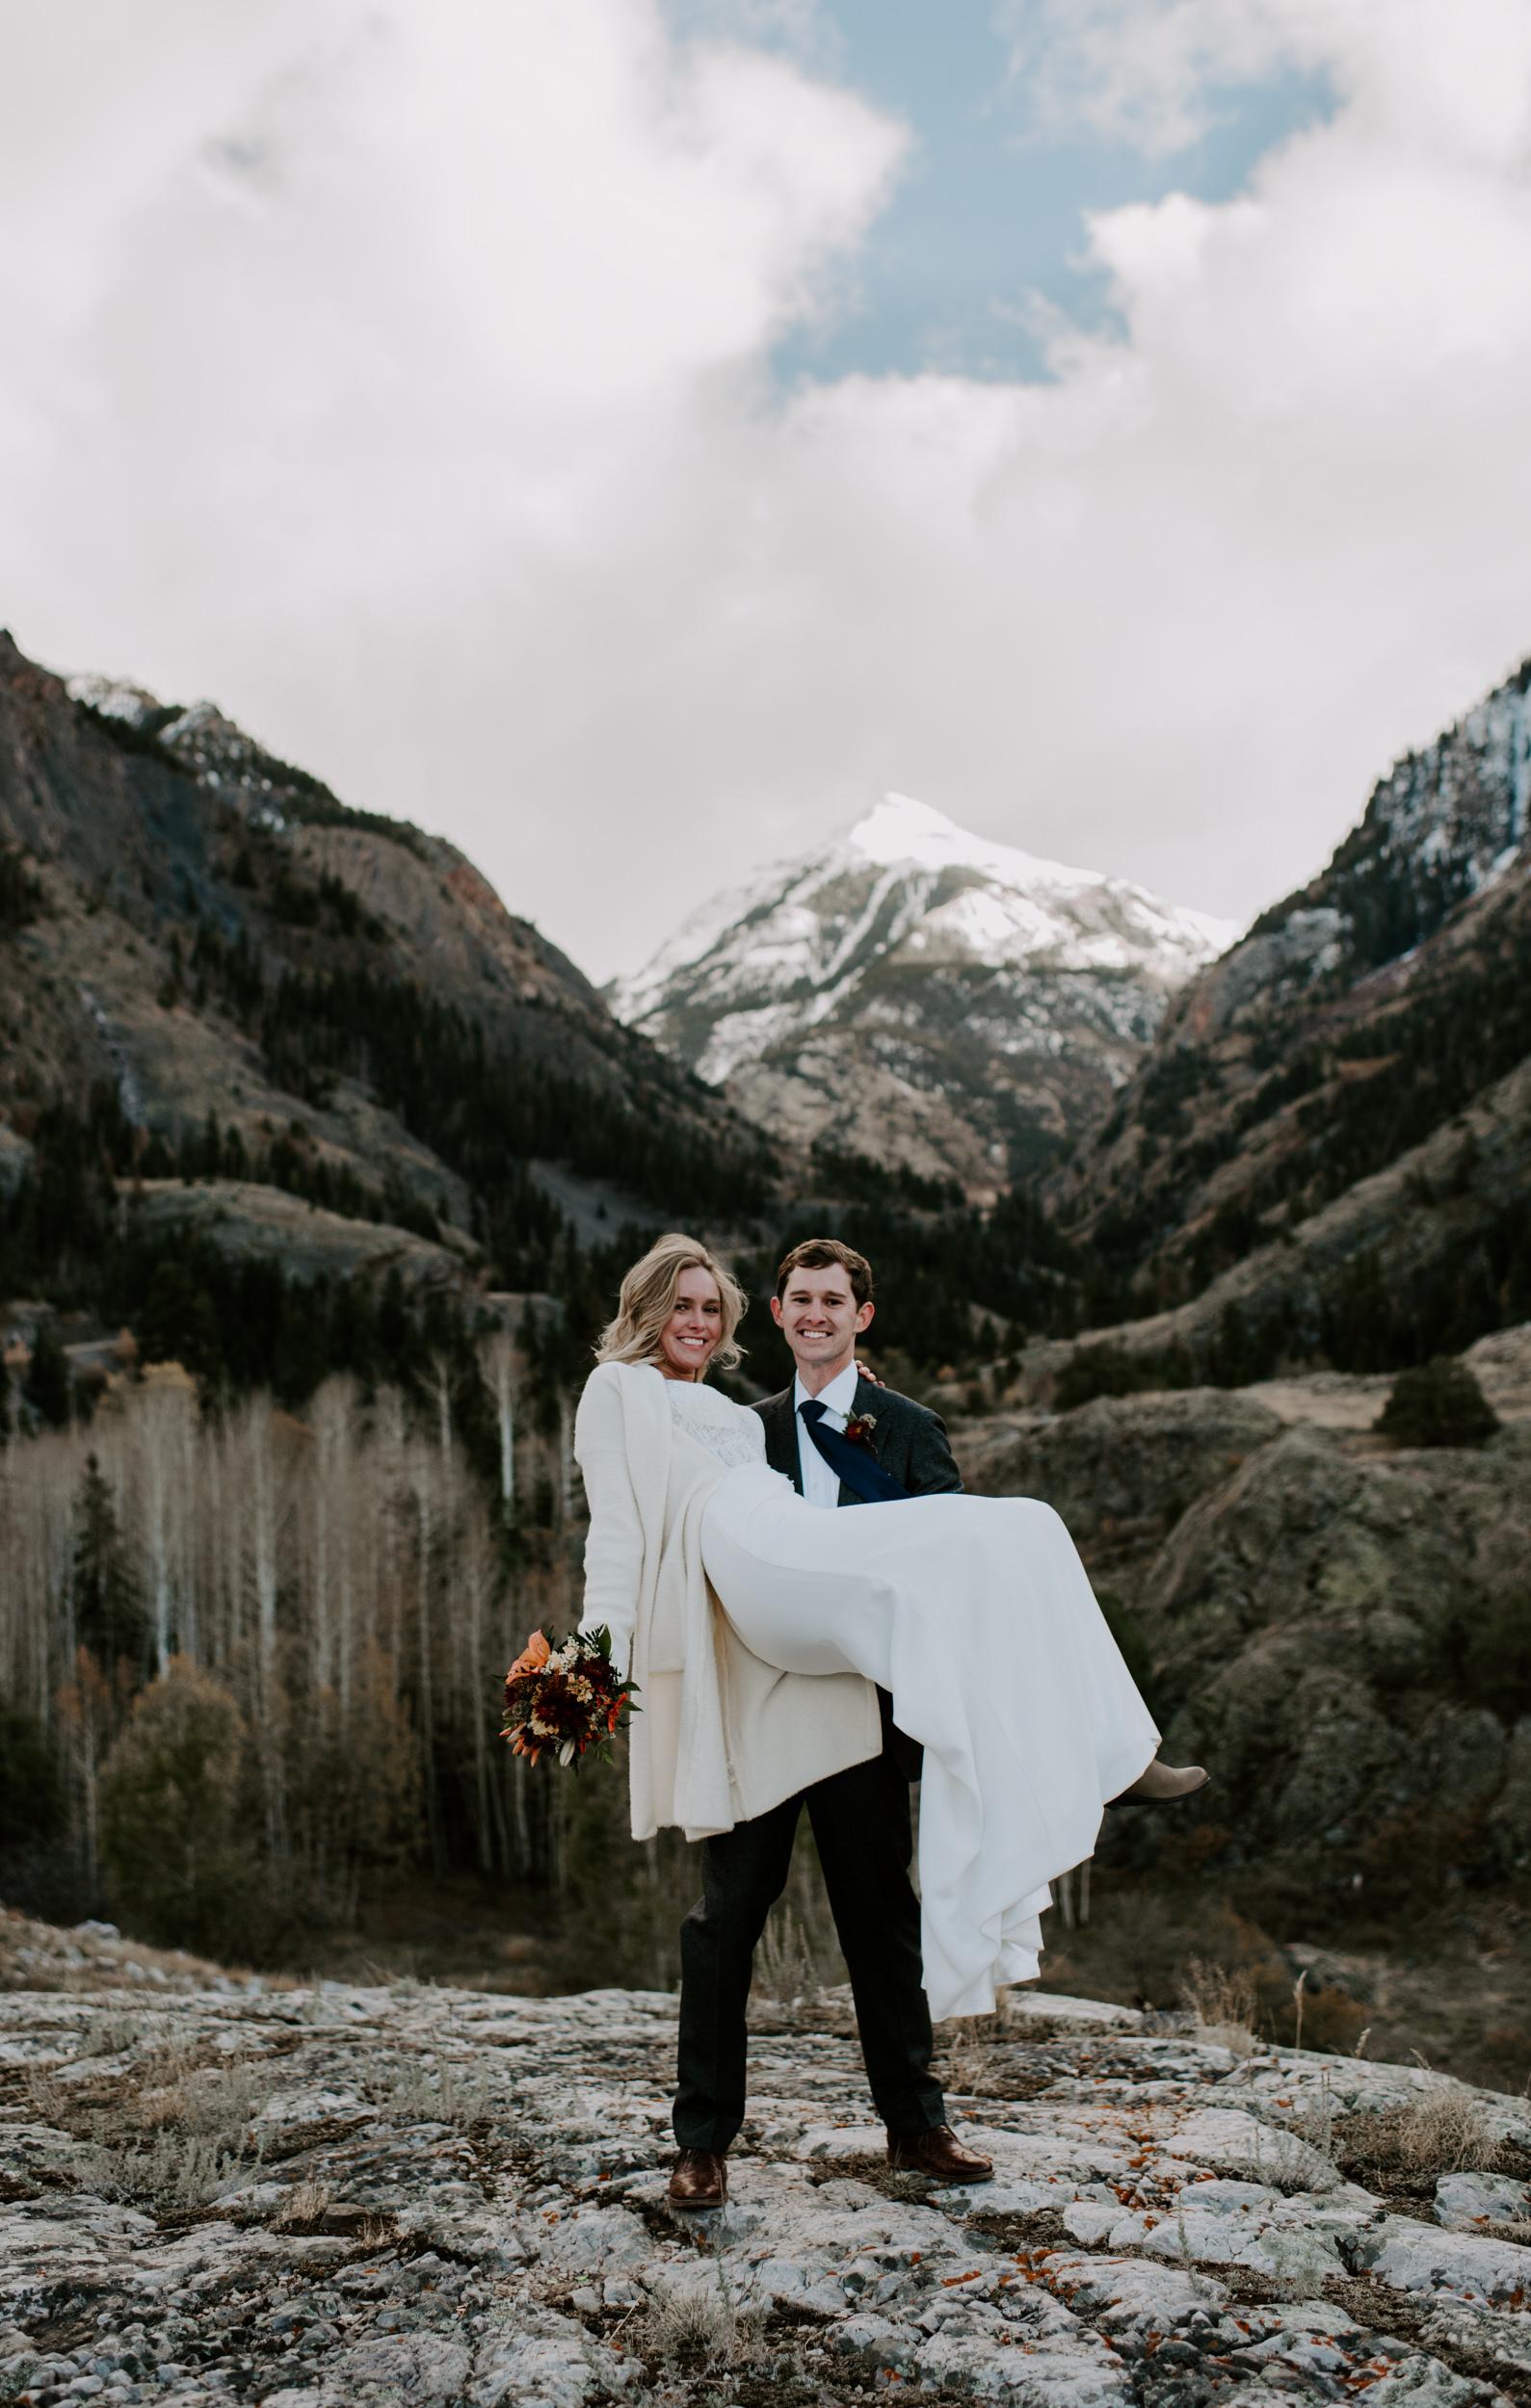 Colorado elopement photography. Denver wedding photographer. Colorado adventure elopement photos.